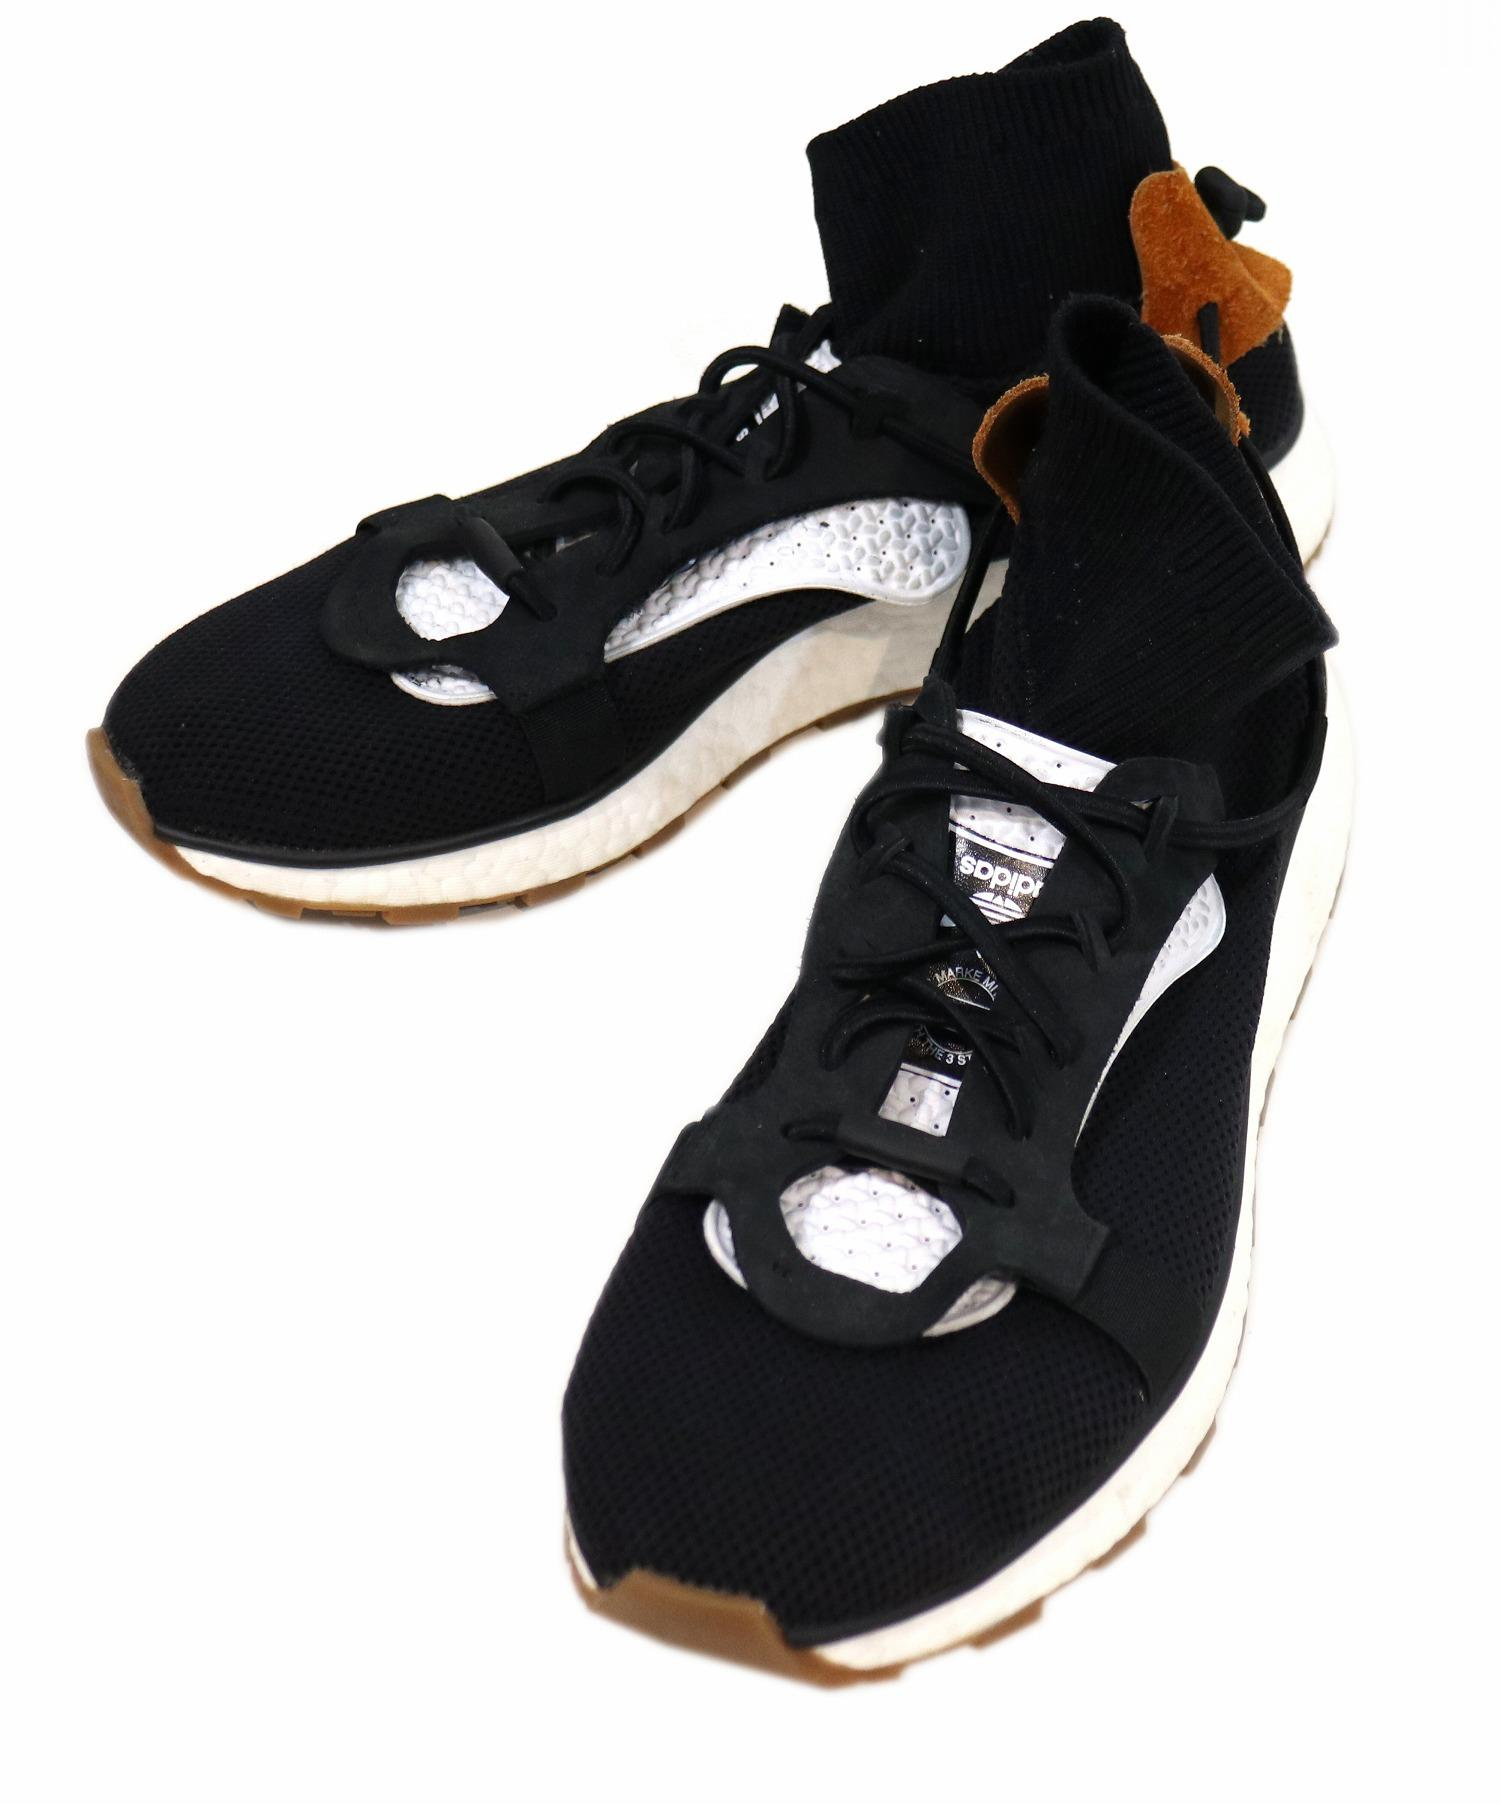 new product 026e8 c5730 adidas×alexander wang